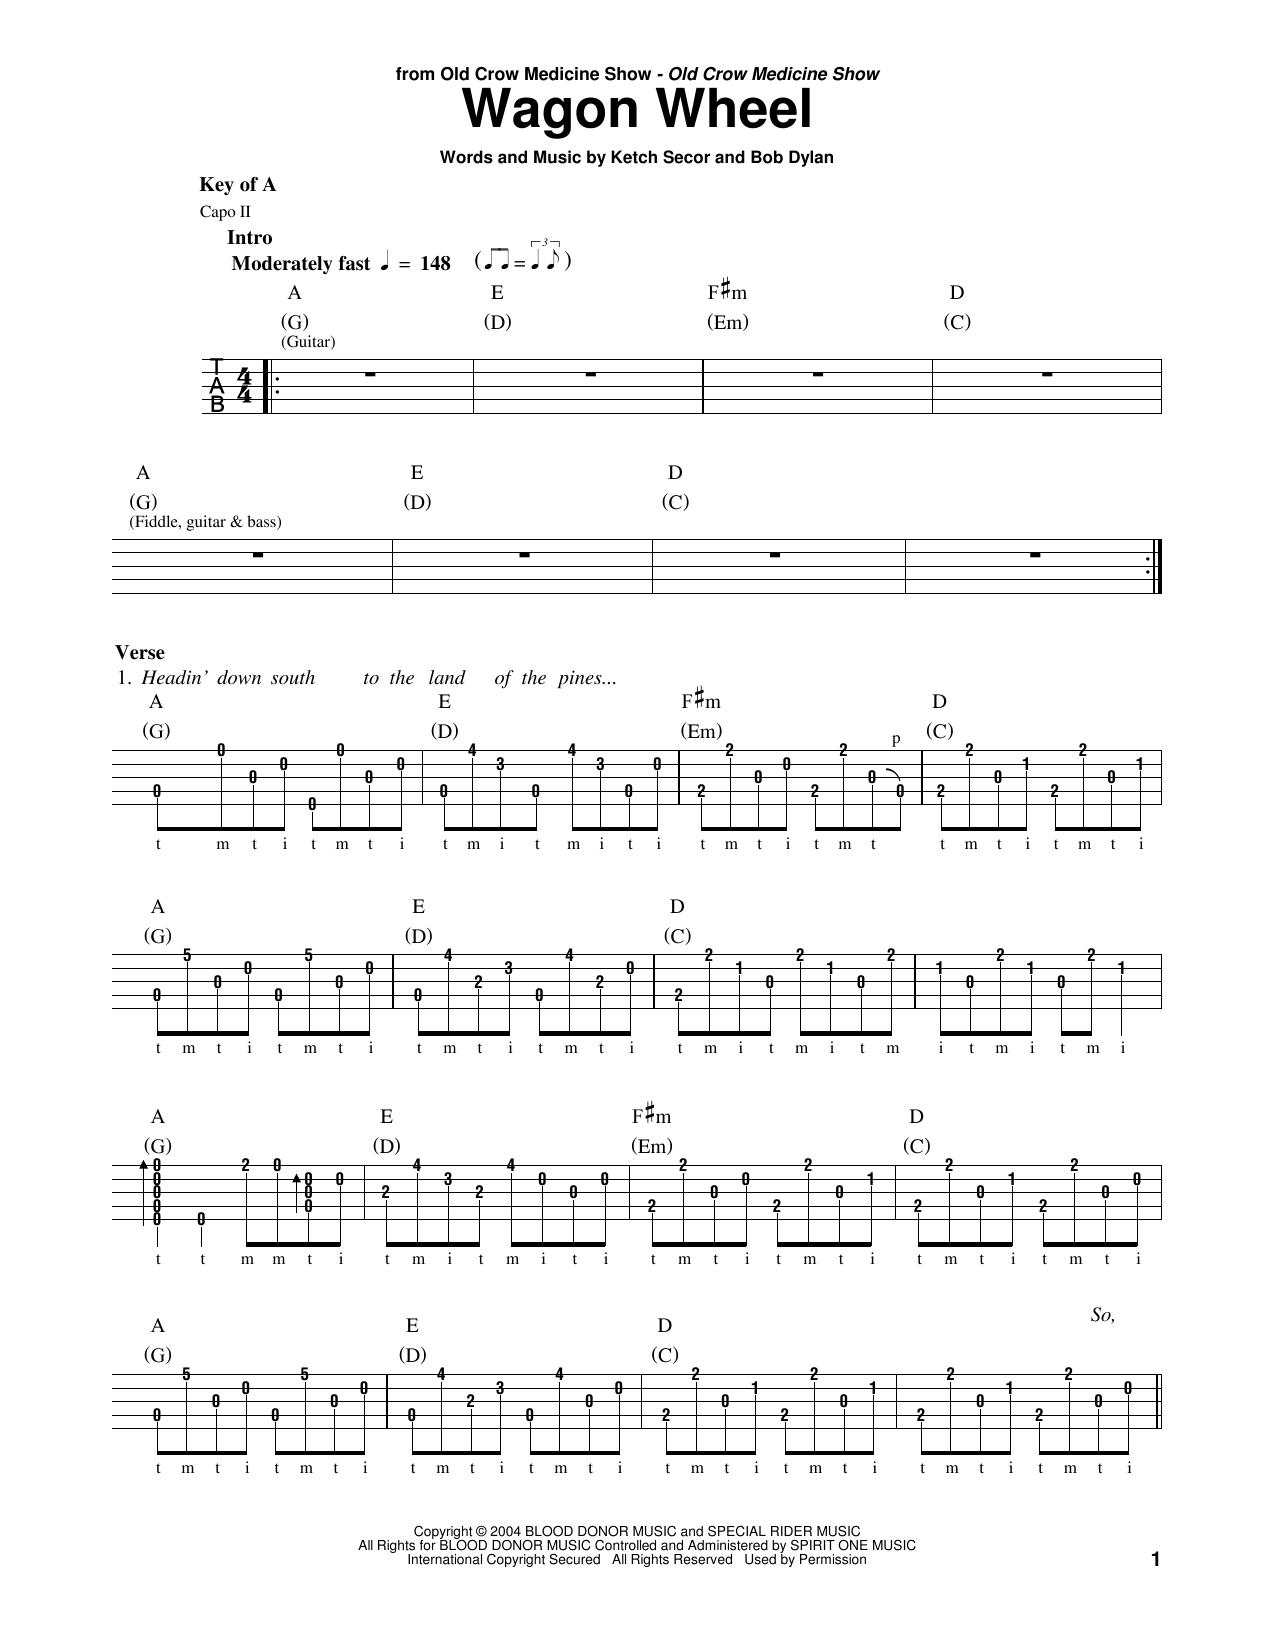 Old Crow Medicine Show 'Wagon Wheel' Sheet Music Notes, Chords | Download  Printable Banjo - SKU: 178446